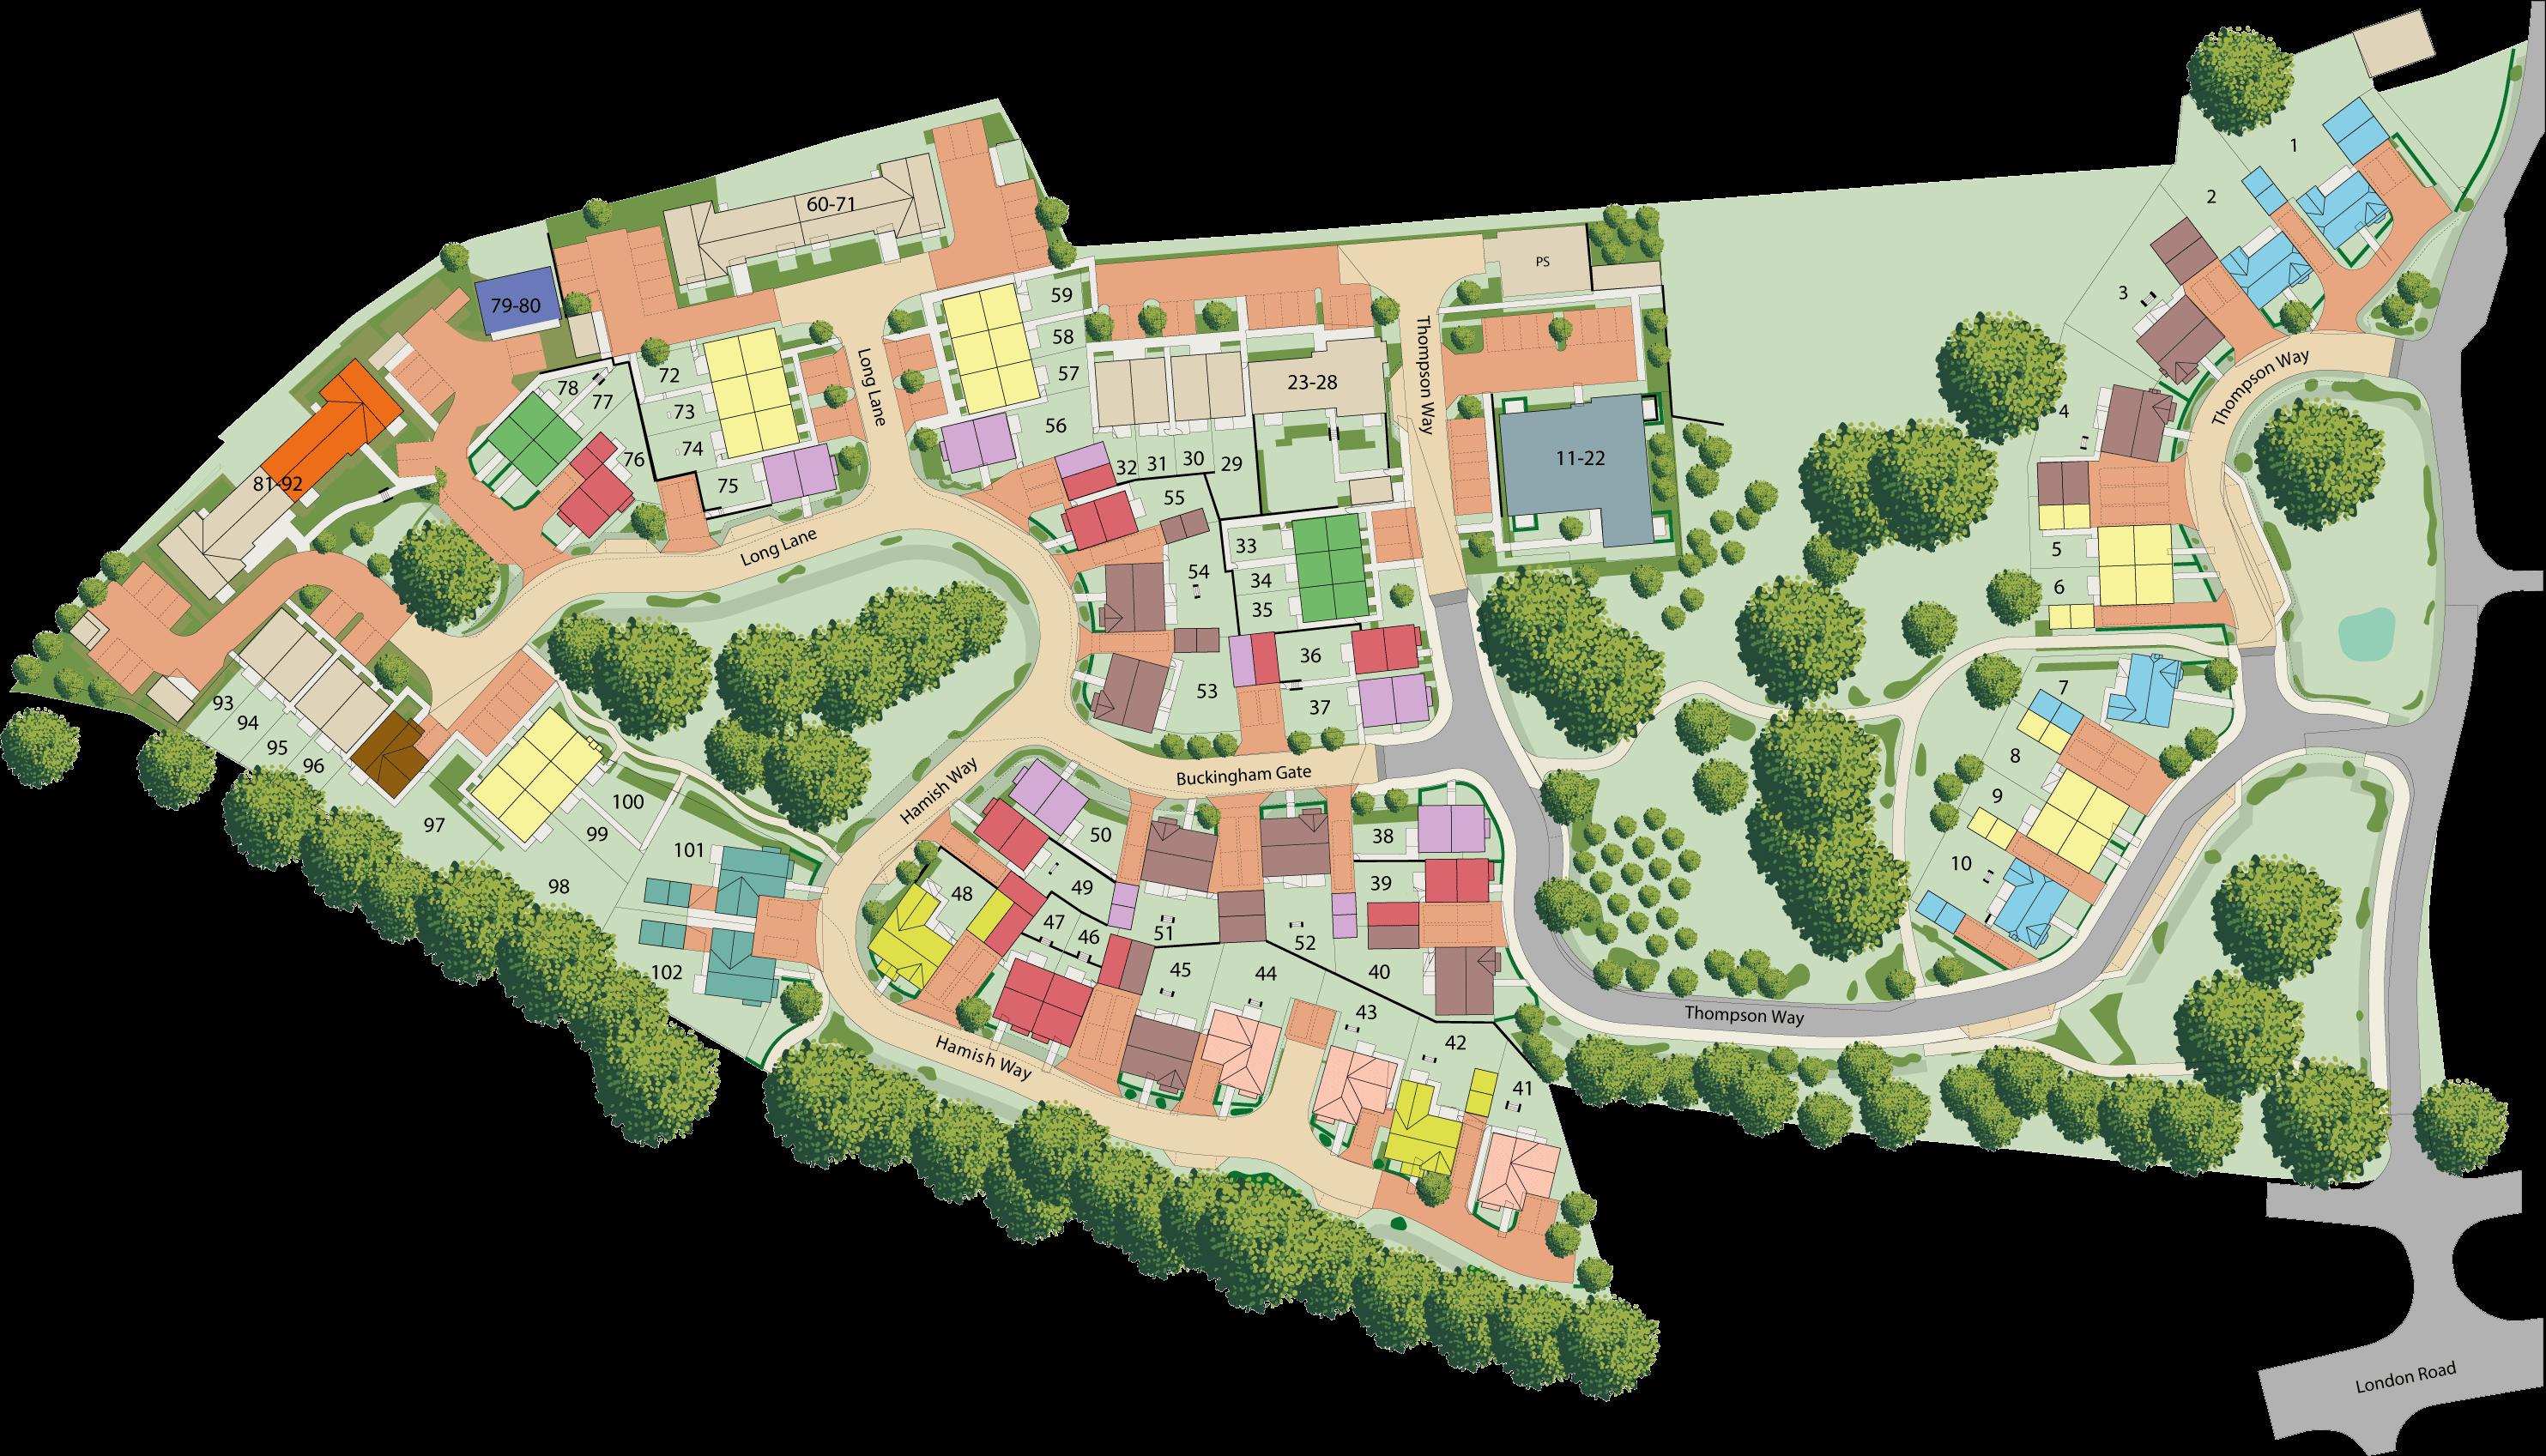 Hoadlands Grange plan